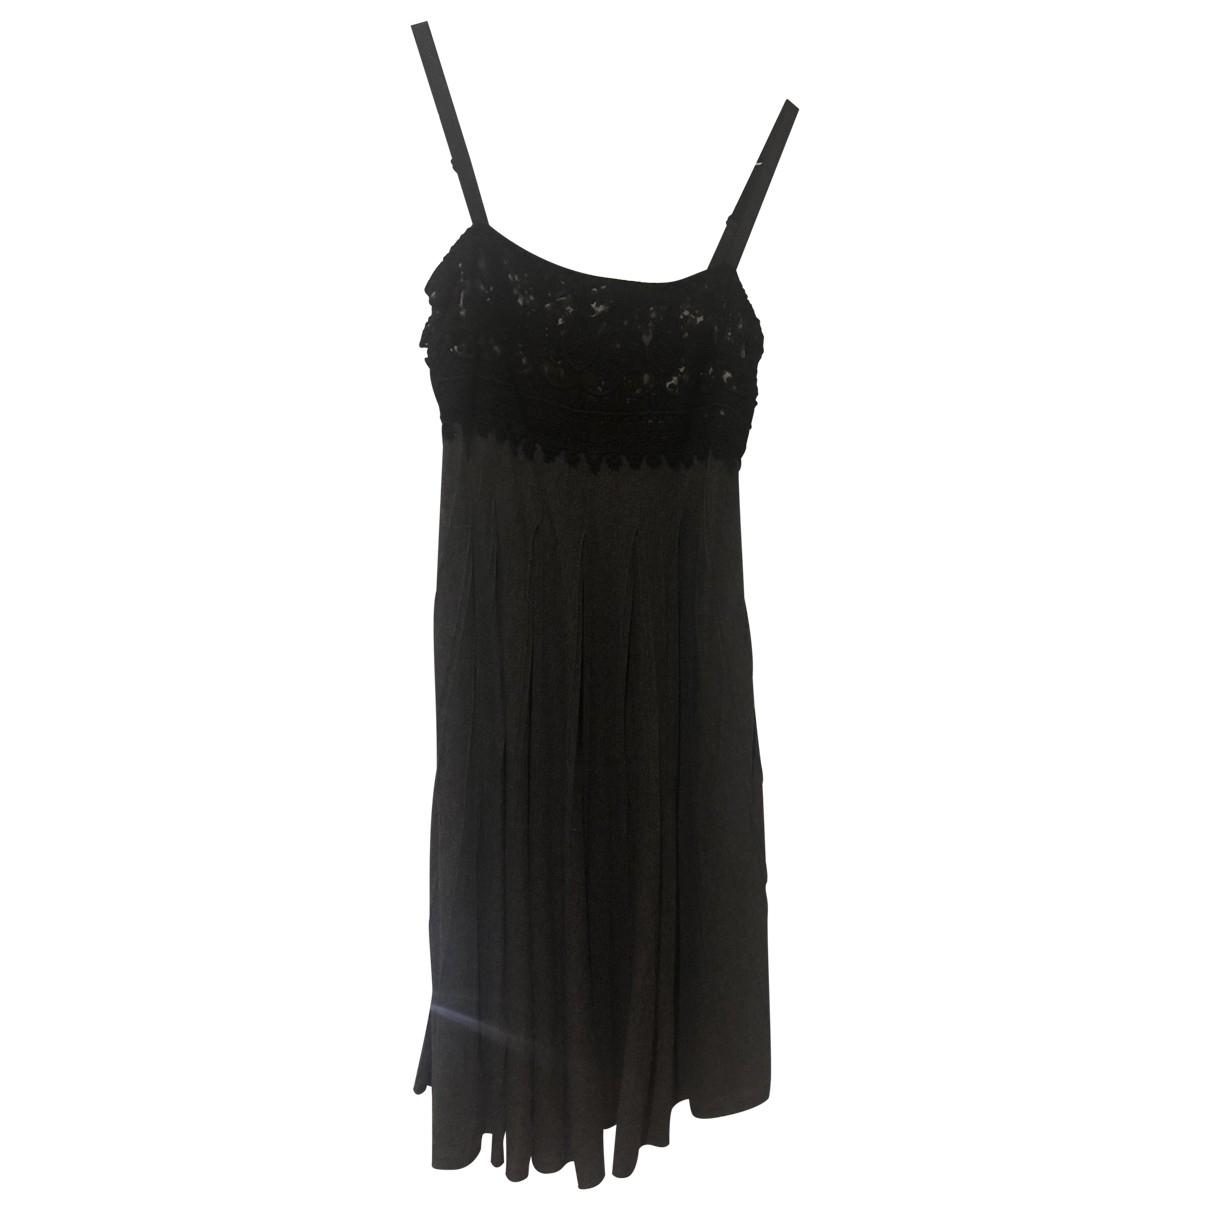 Max & Co \N Grey dress for Women S International